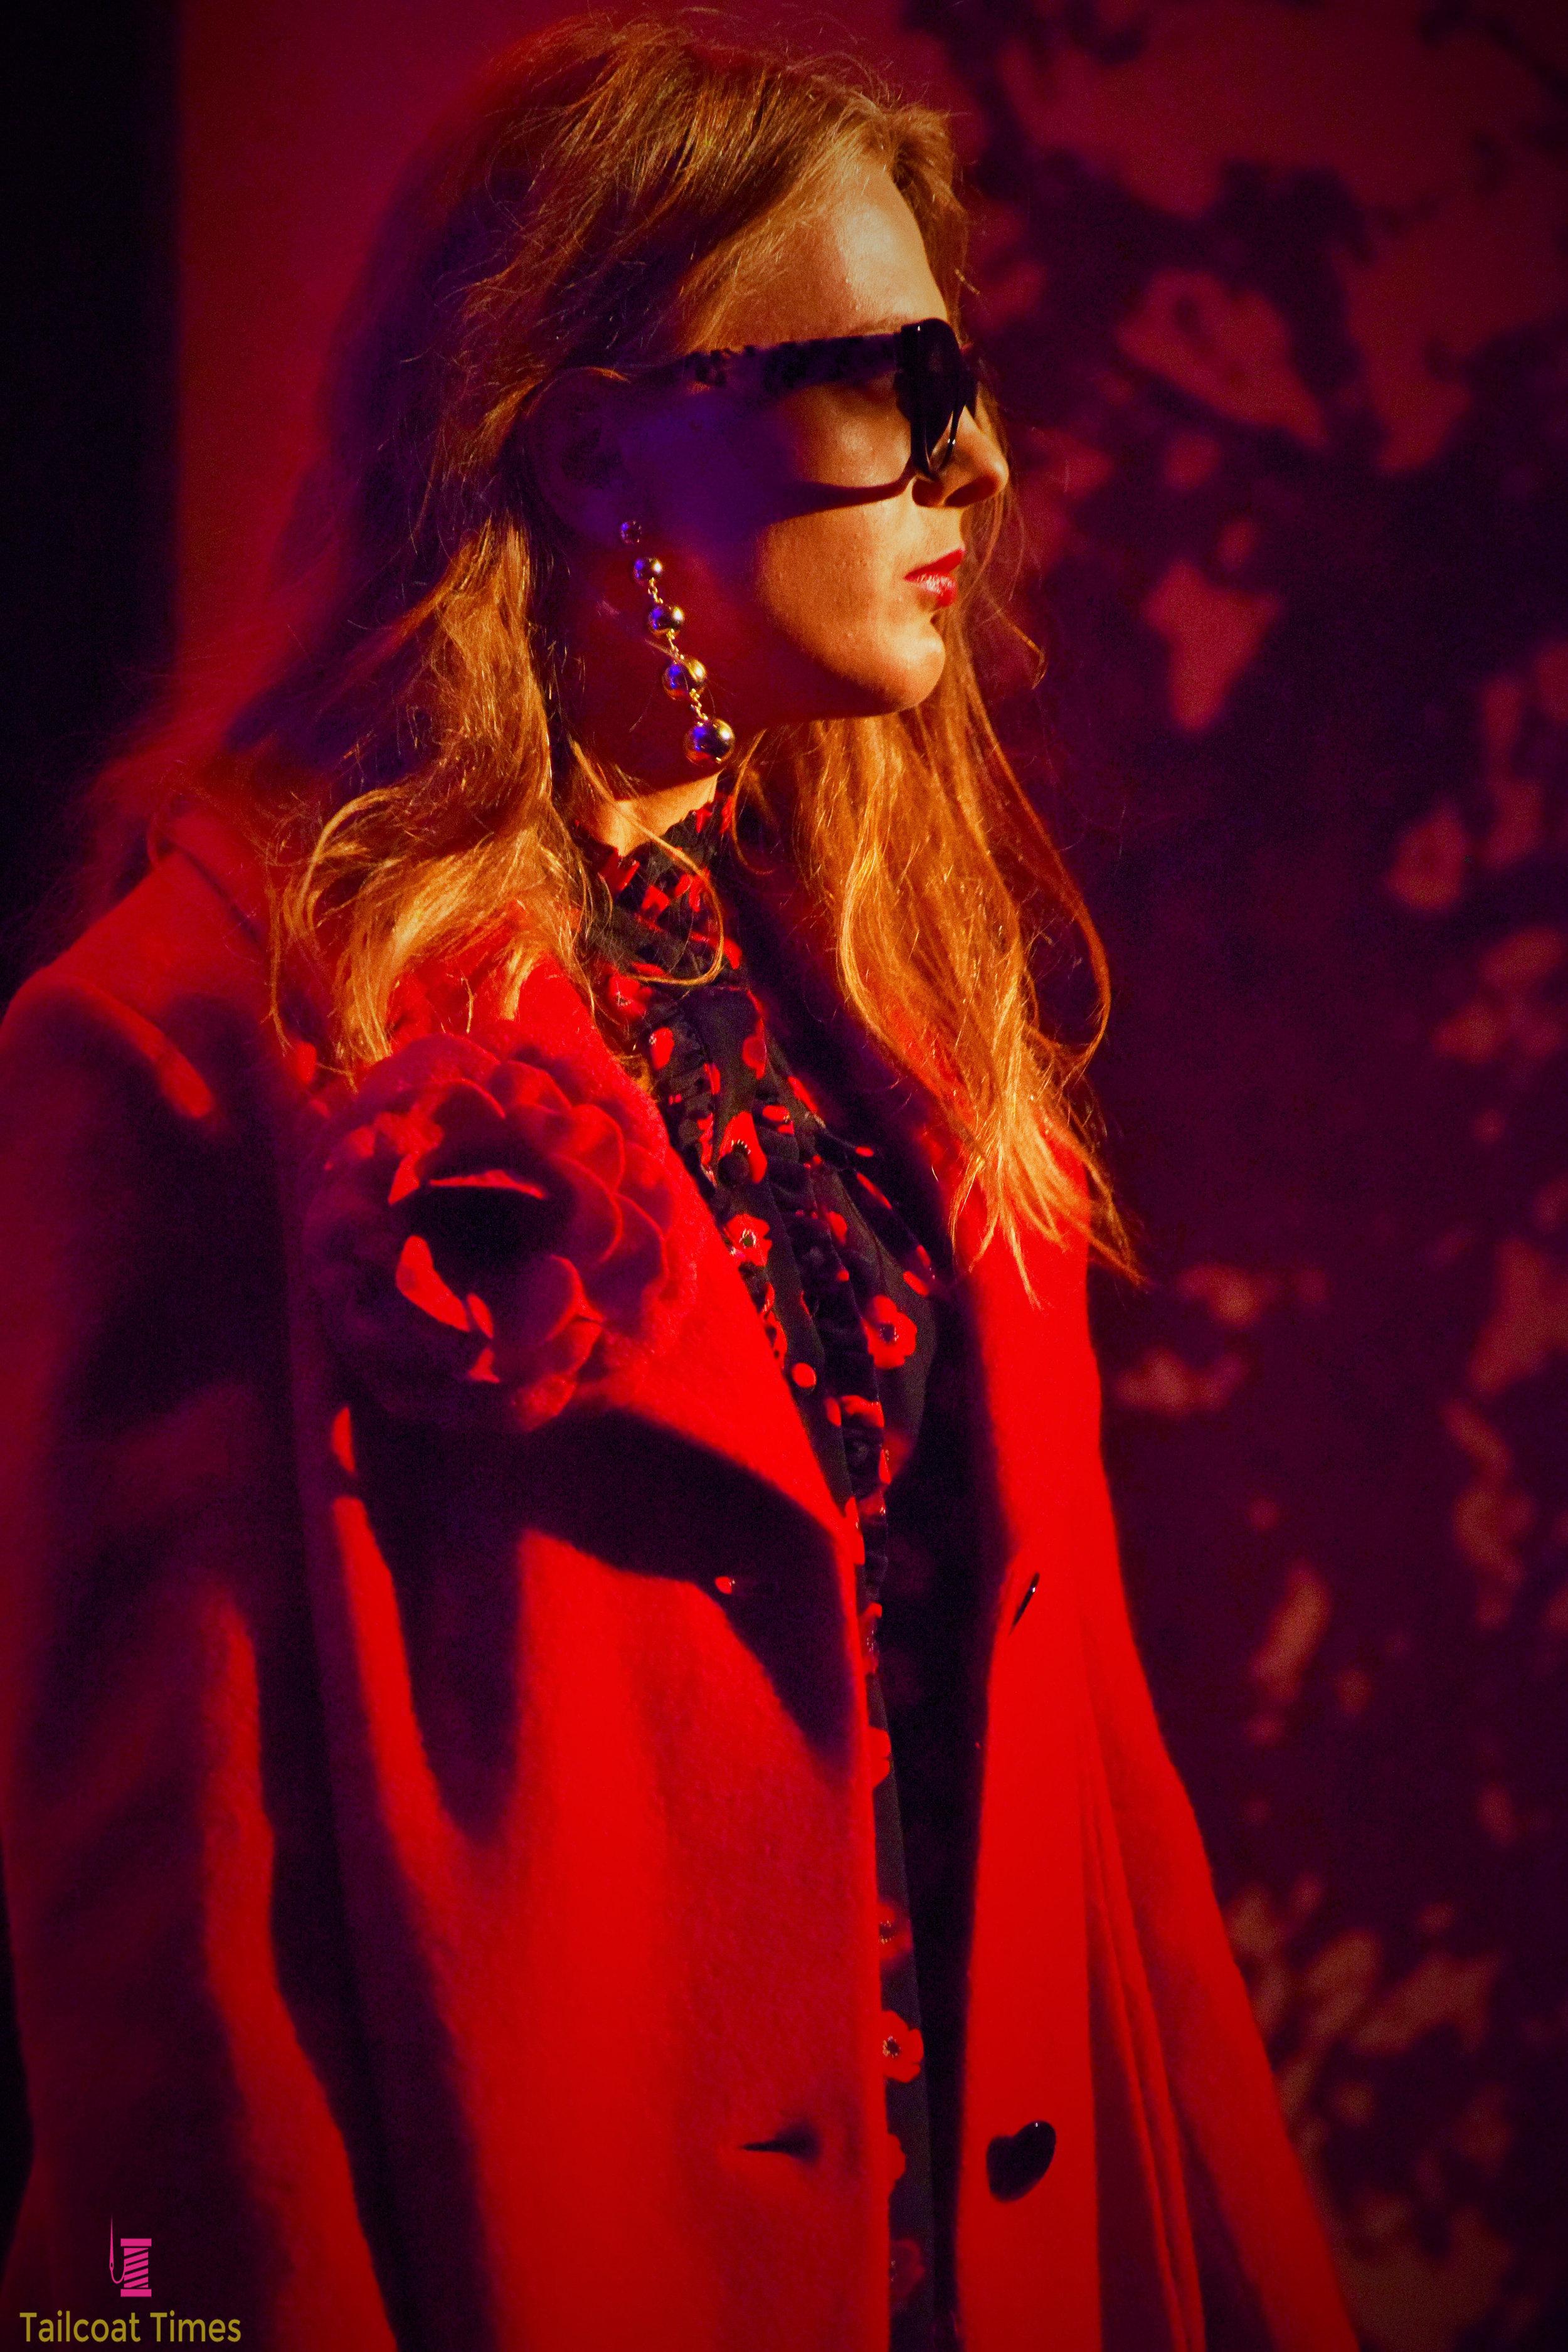 FashionablyLate_Kate Spade_Tailcoat Times (19 of 23).jpg